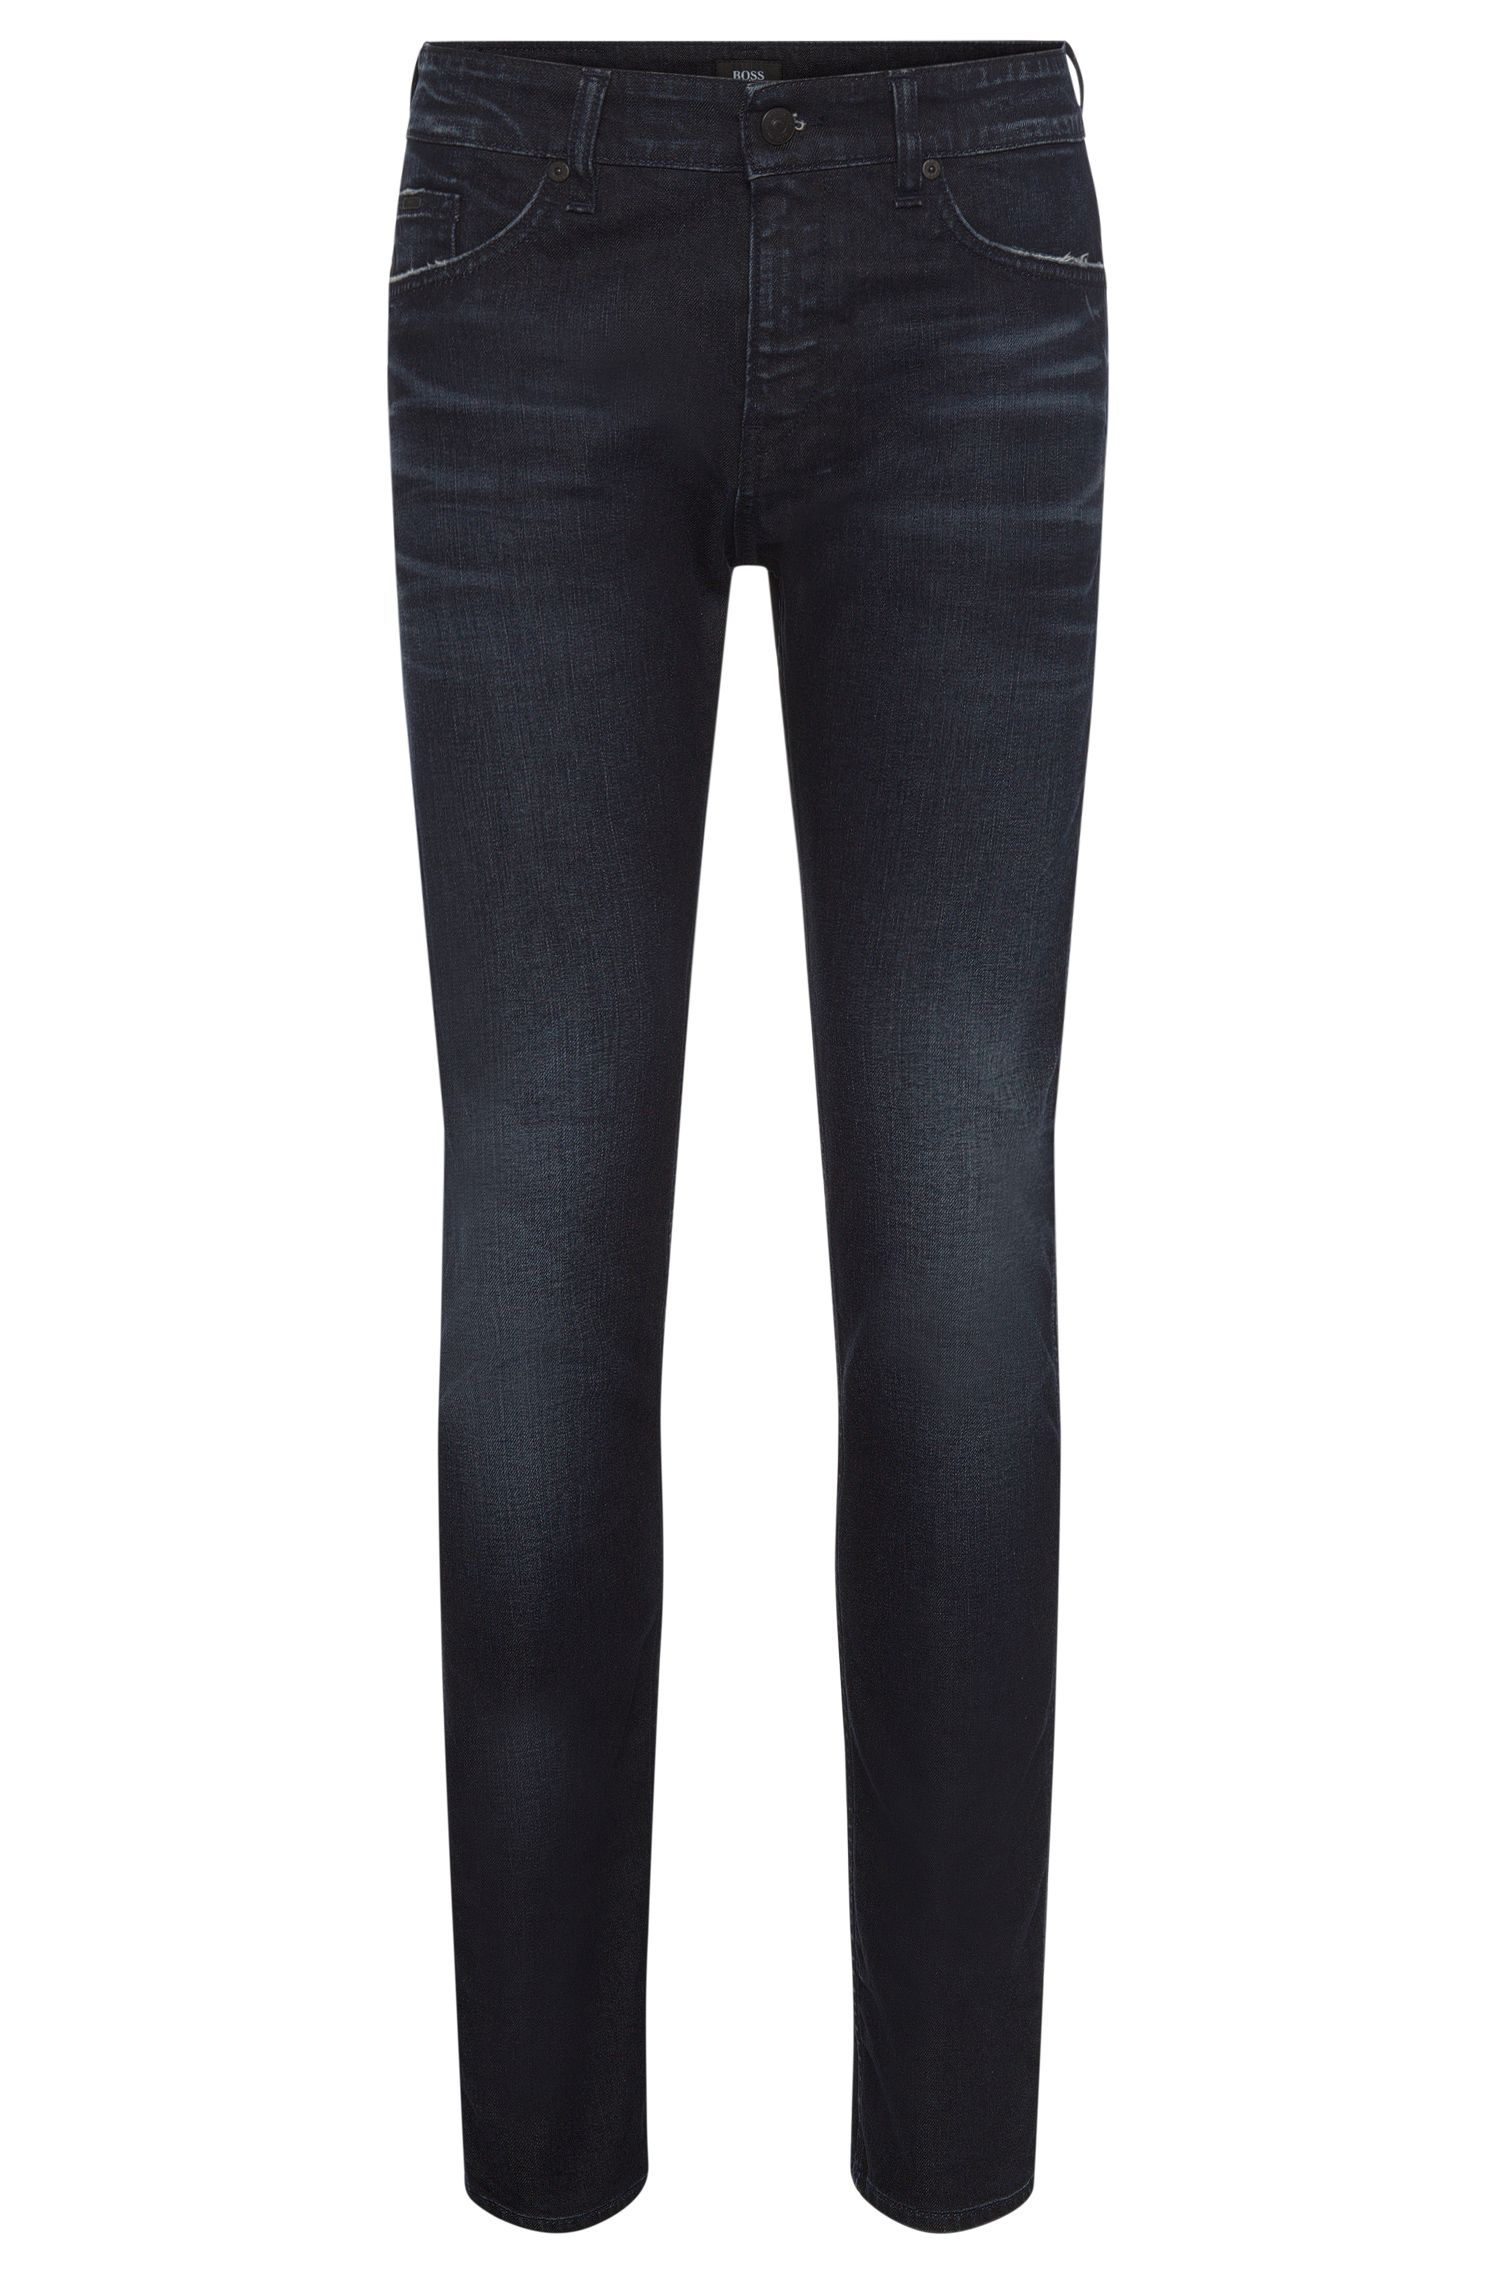 11 oz Stretch Cotton Blend Jeans, Slim Fit | Delaware